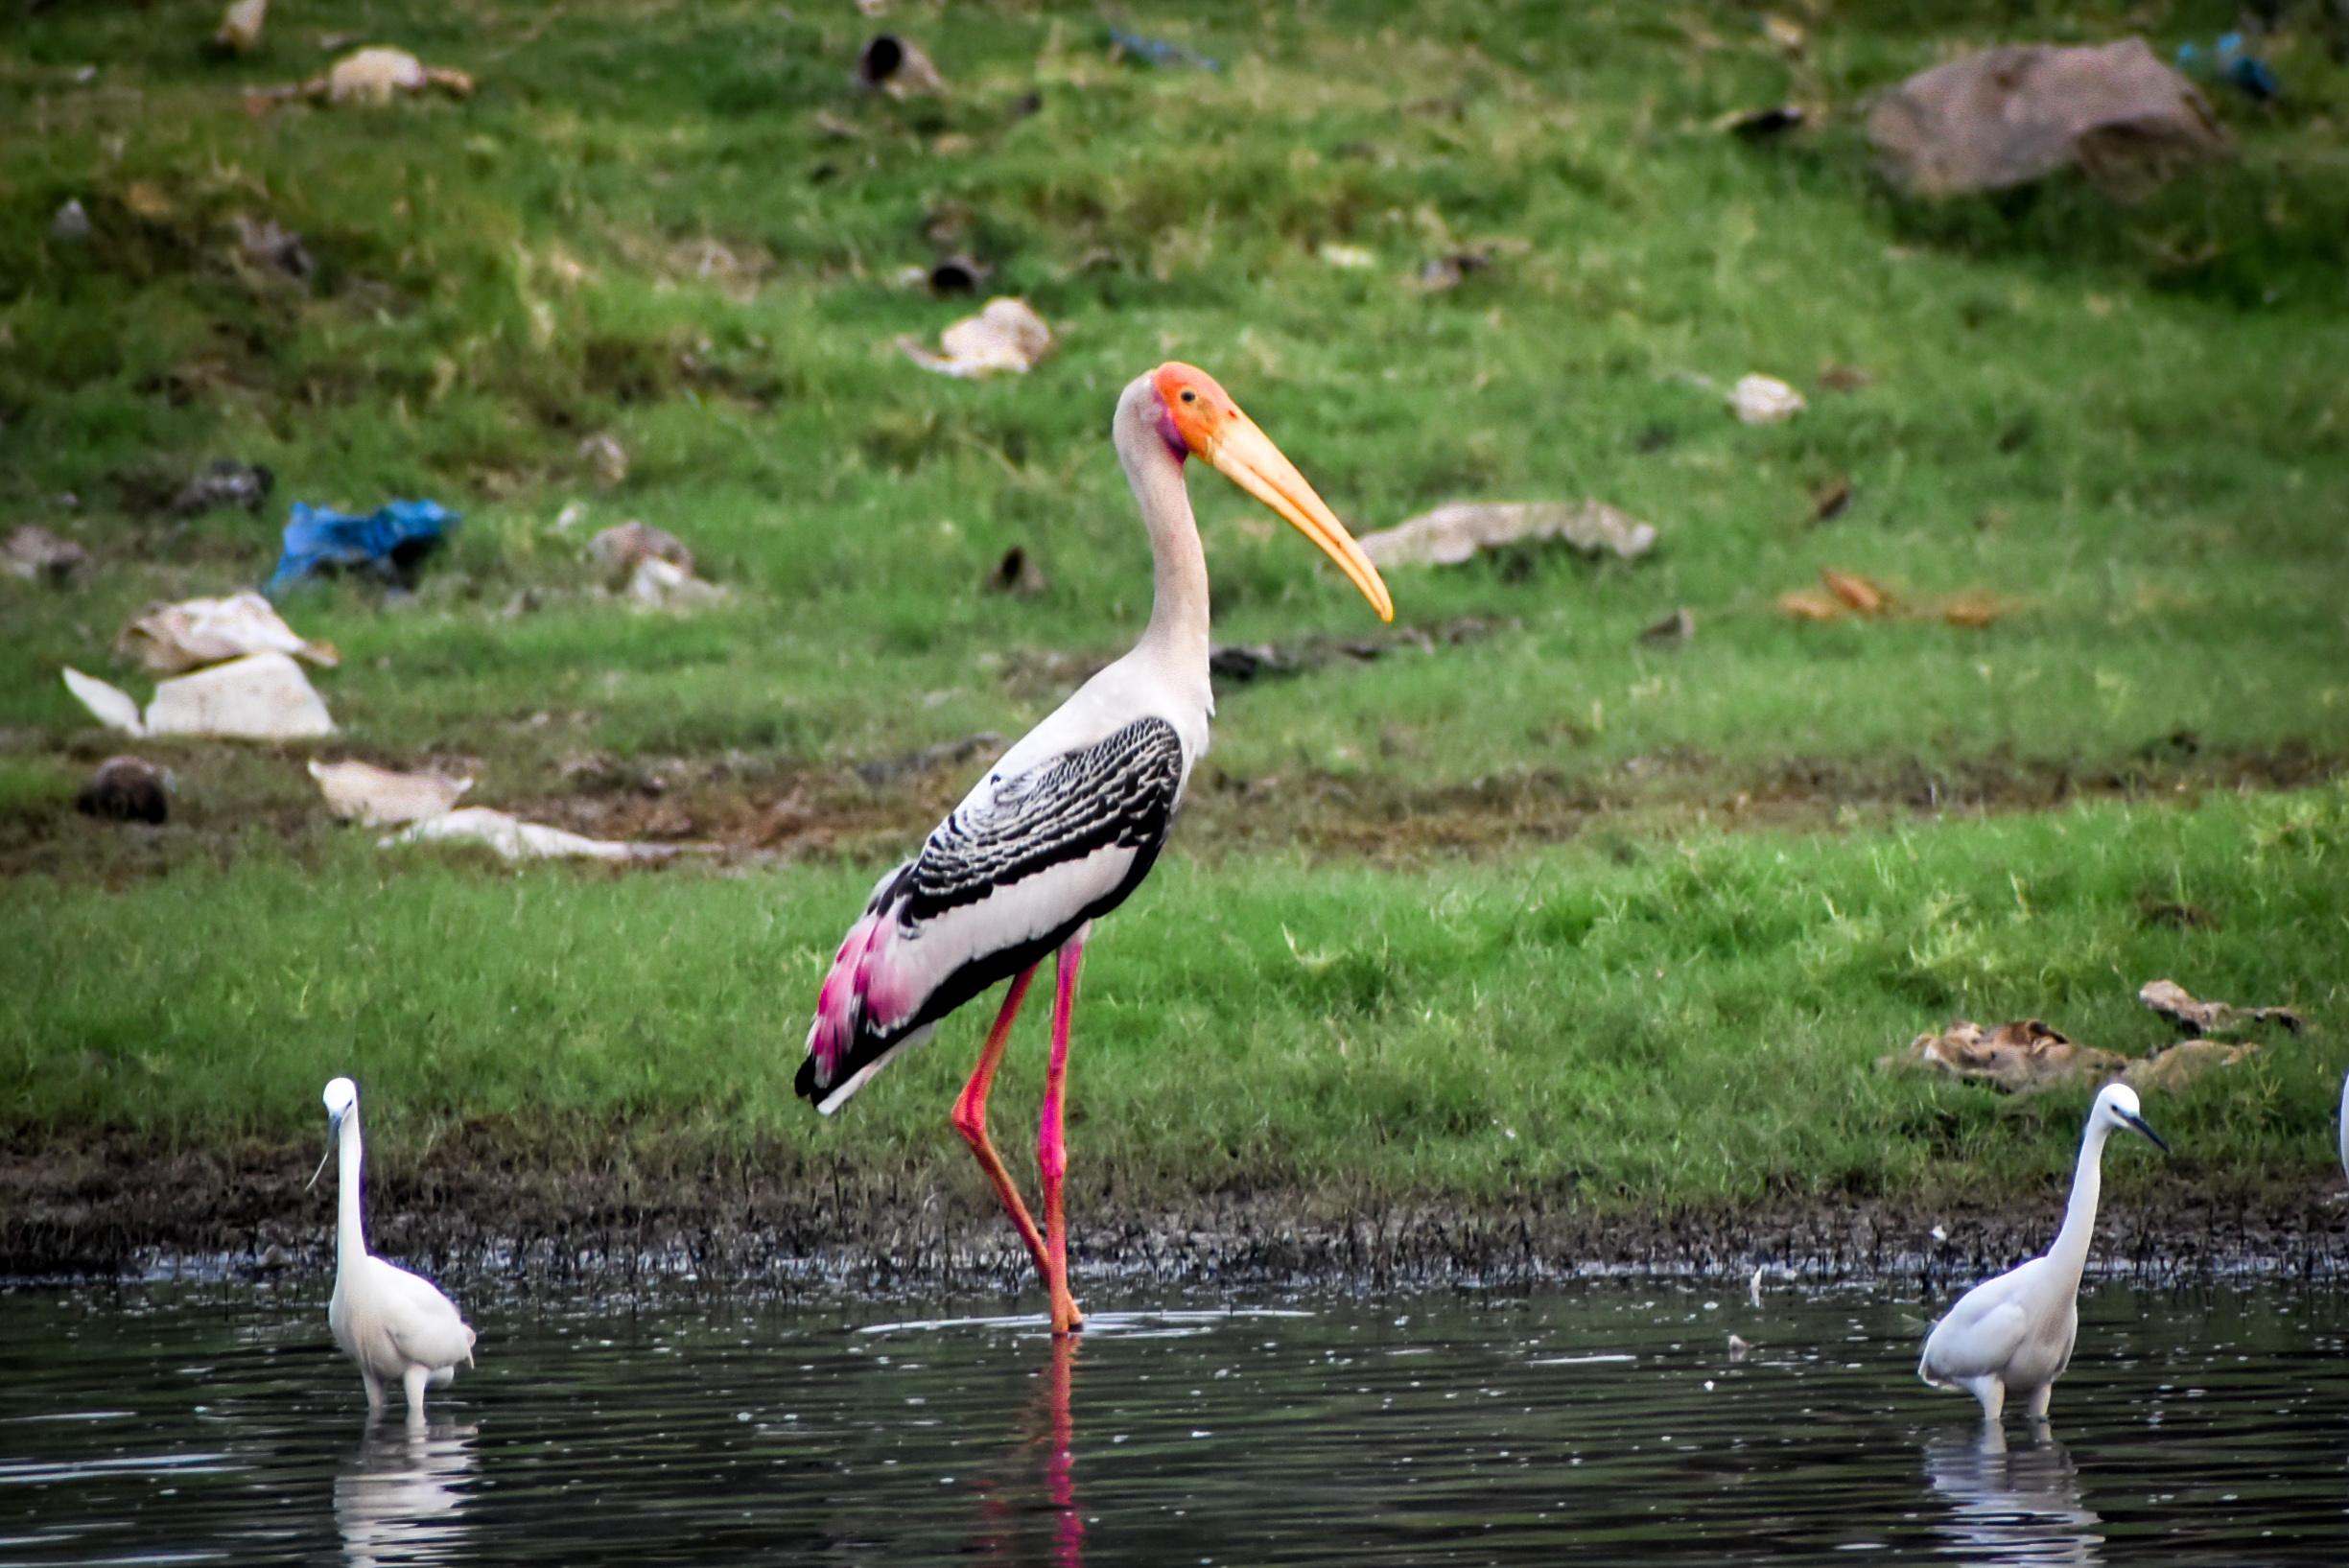 Stork birds in a water resource